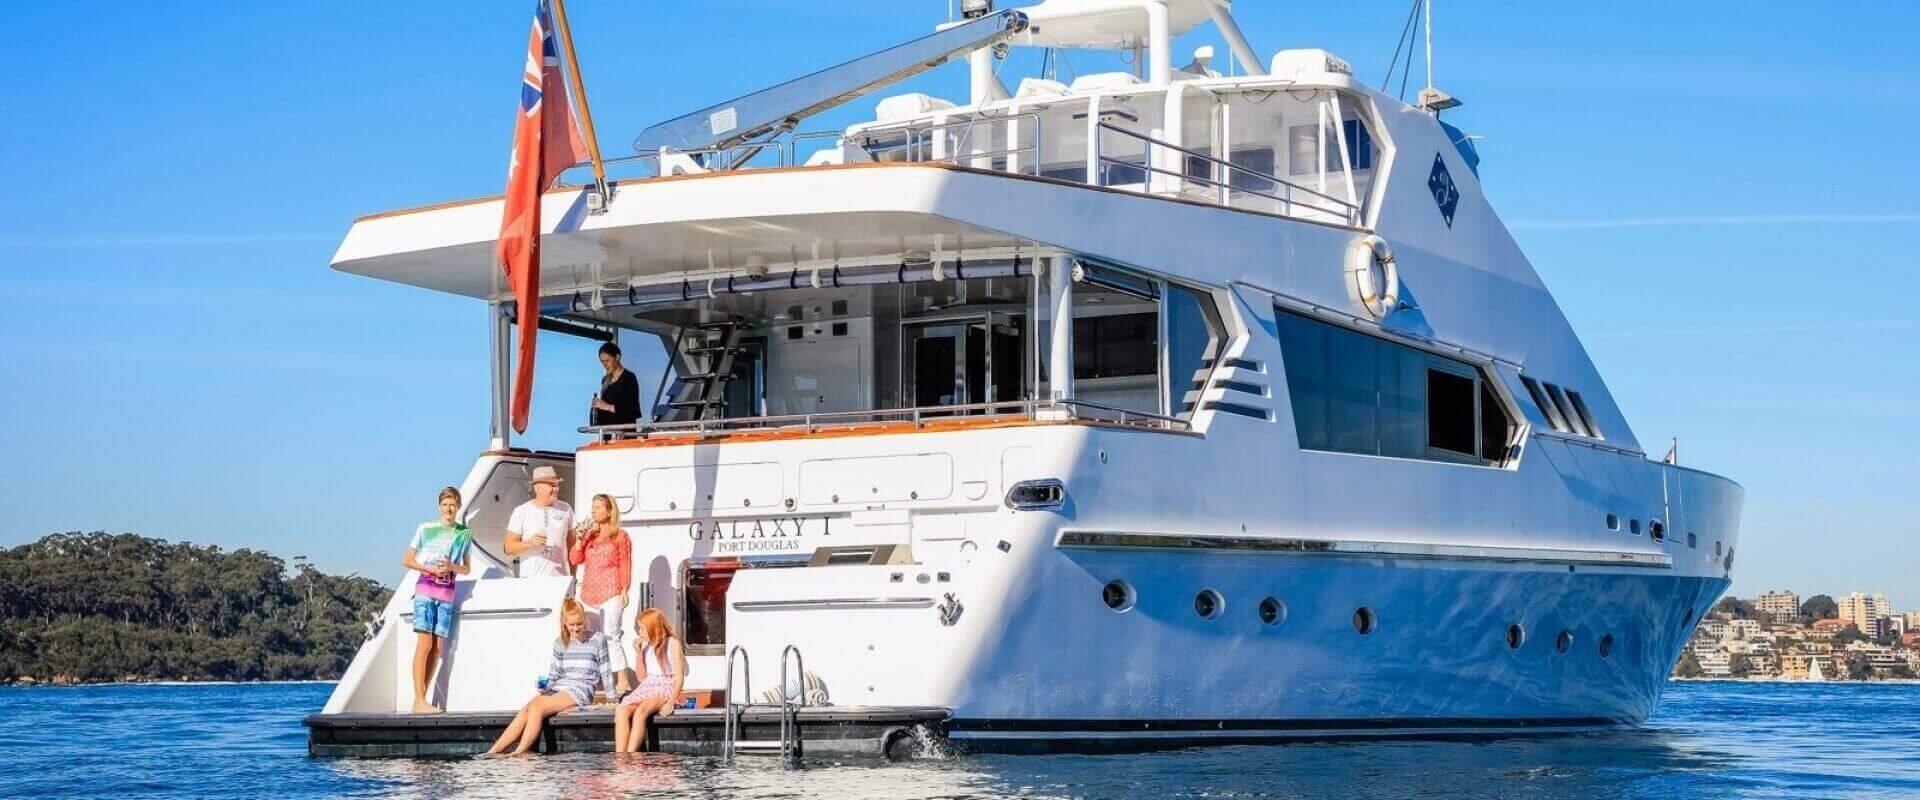 Galaxy I charter yacht. © Salty Dingo 2017